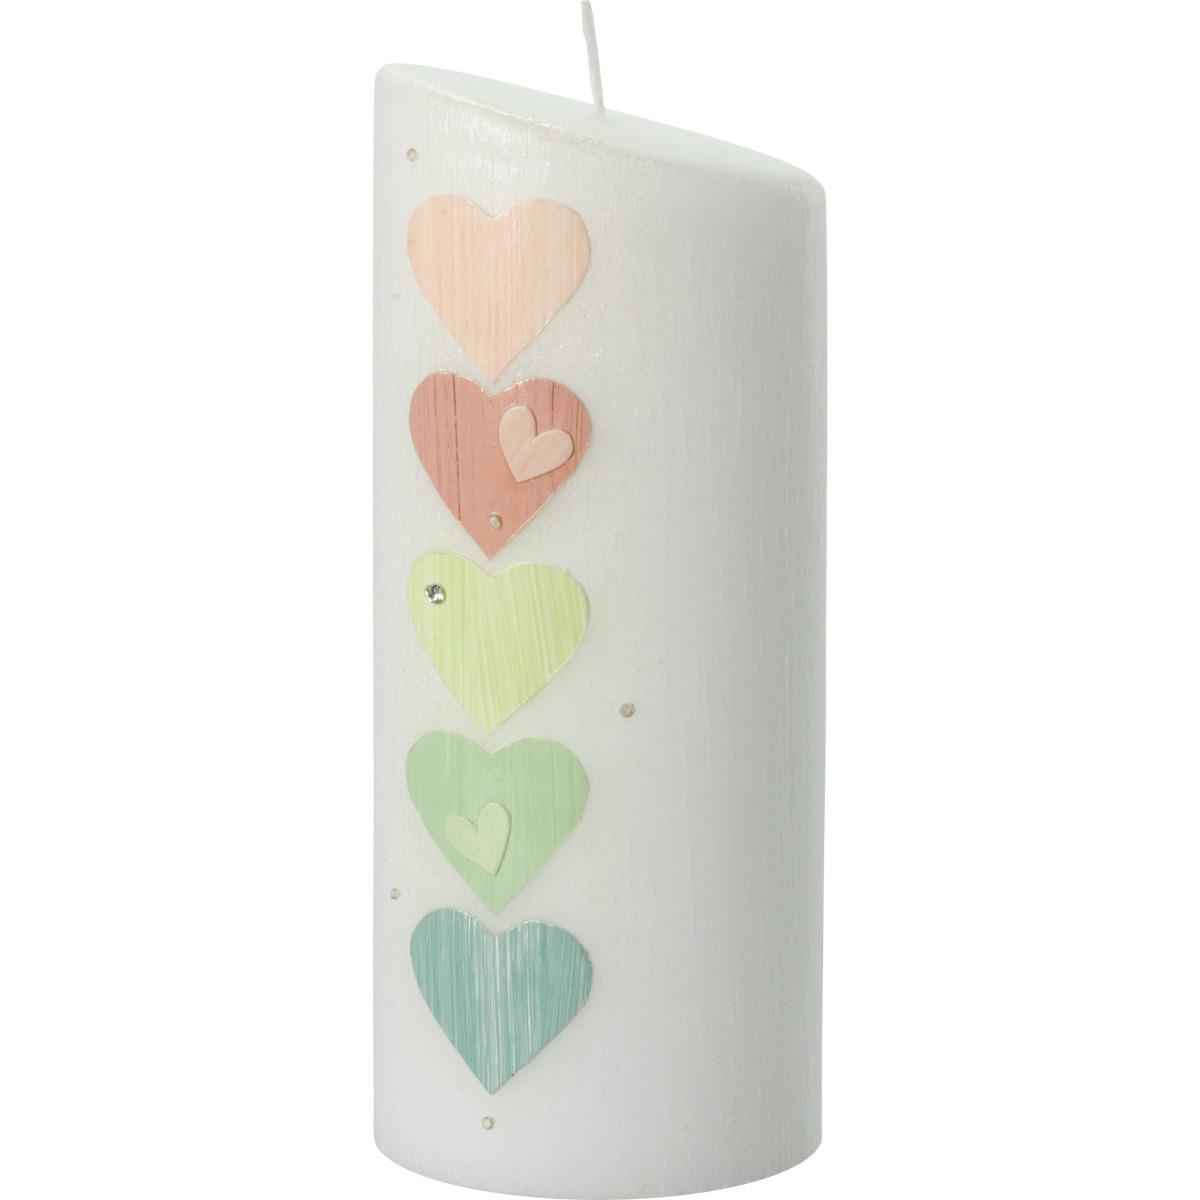 Hochzeitskerze, 5019, Oval 230x90x60, 5Herzen, rosa-grüntöne-silber